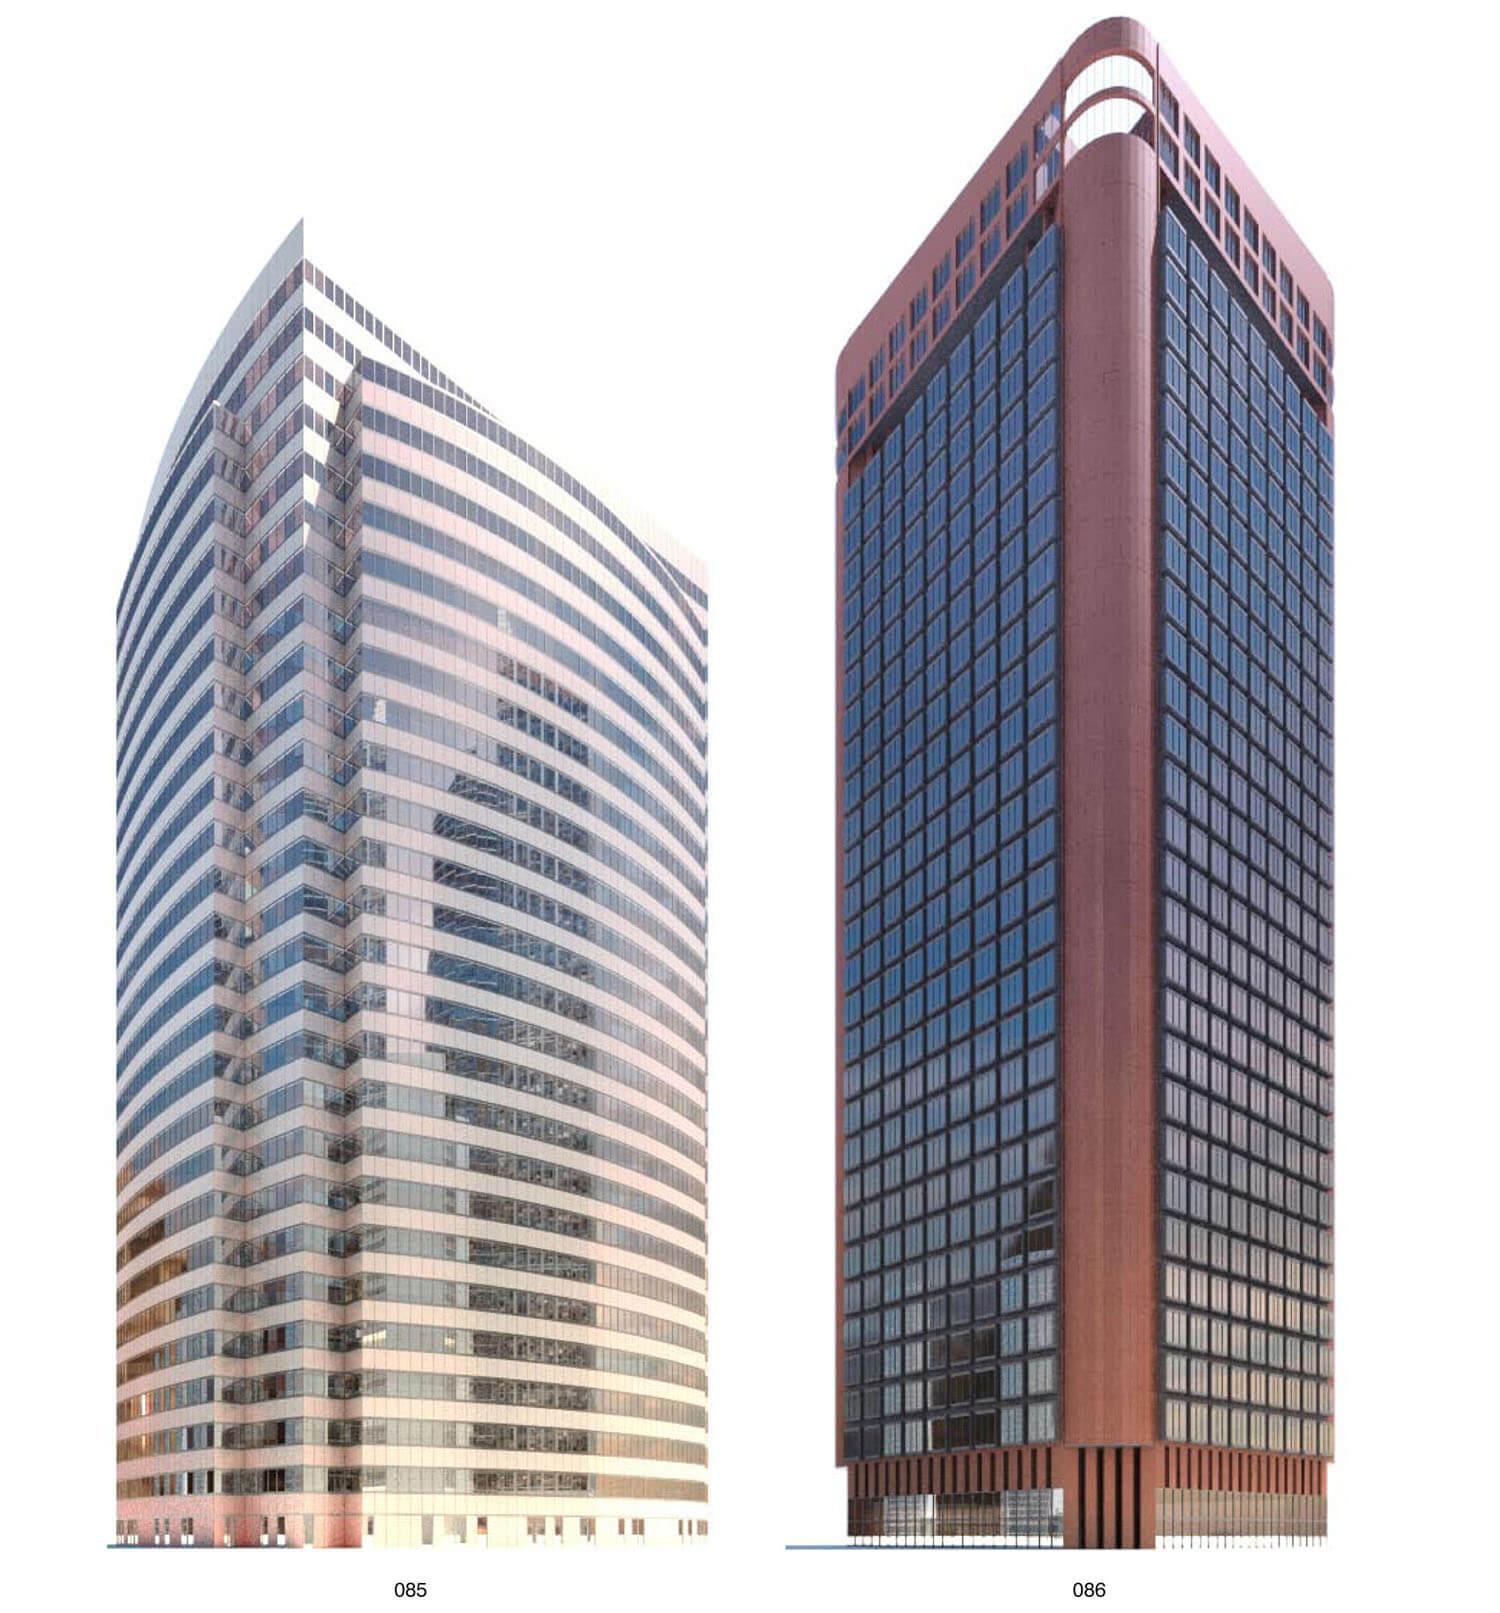 2 building kiểu vát góc